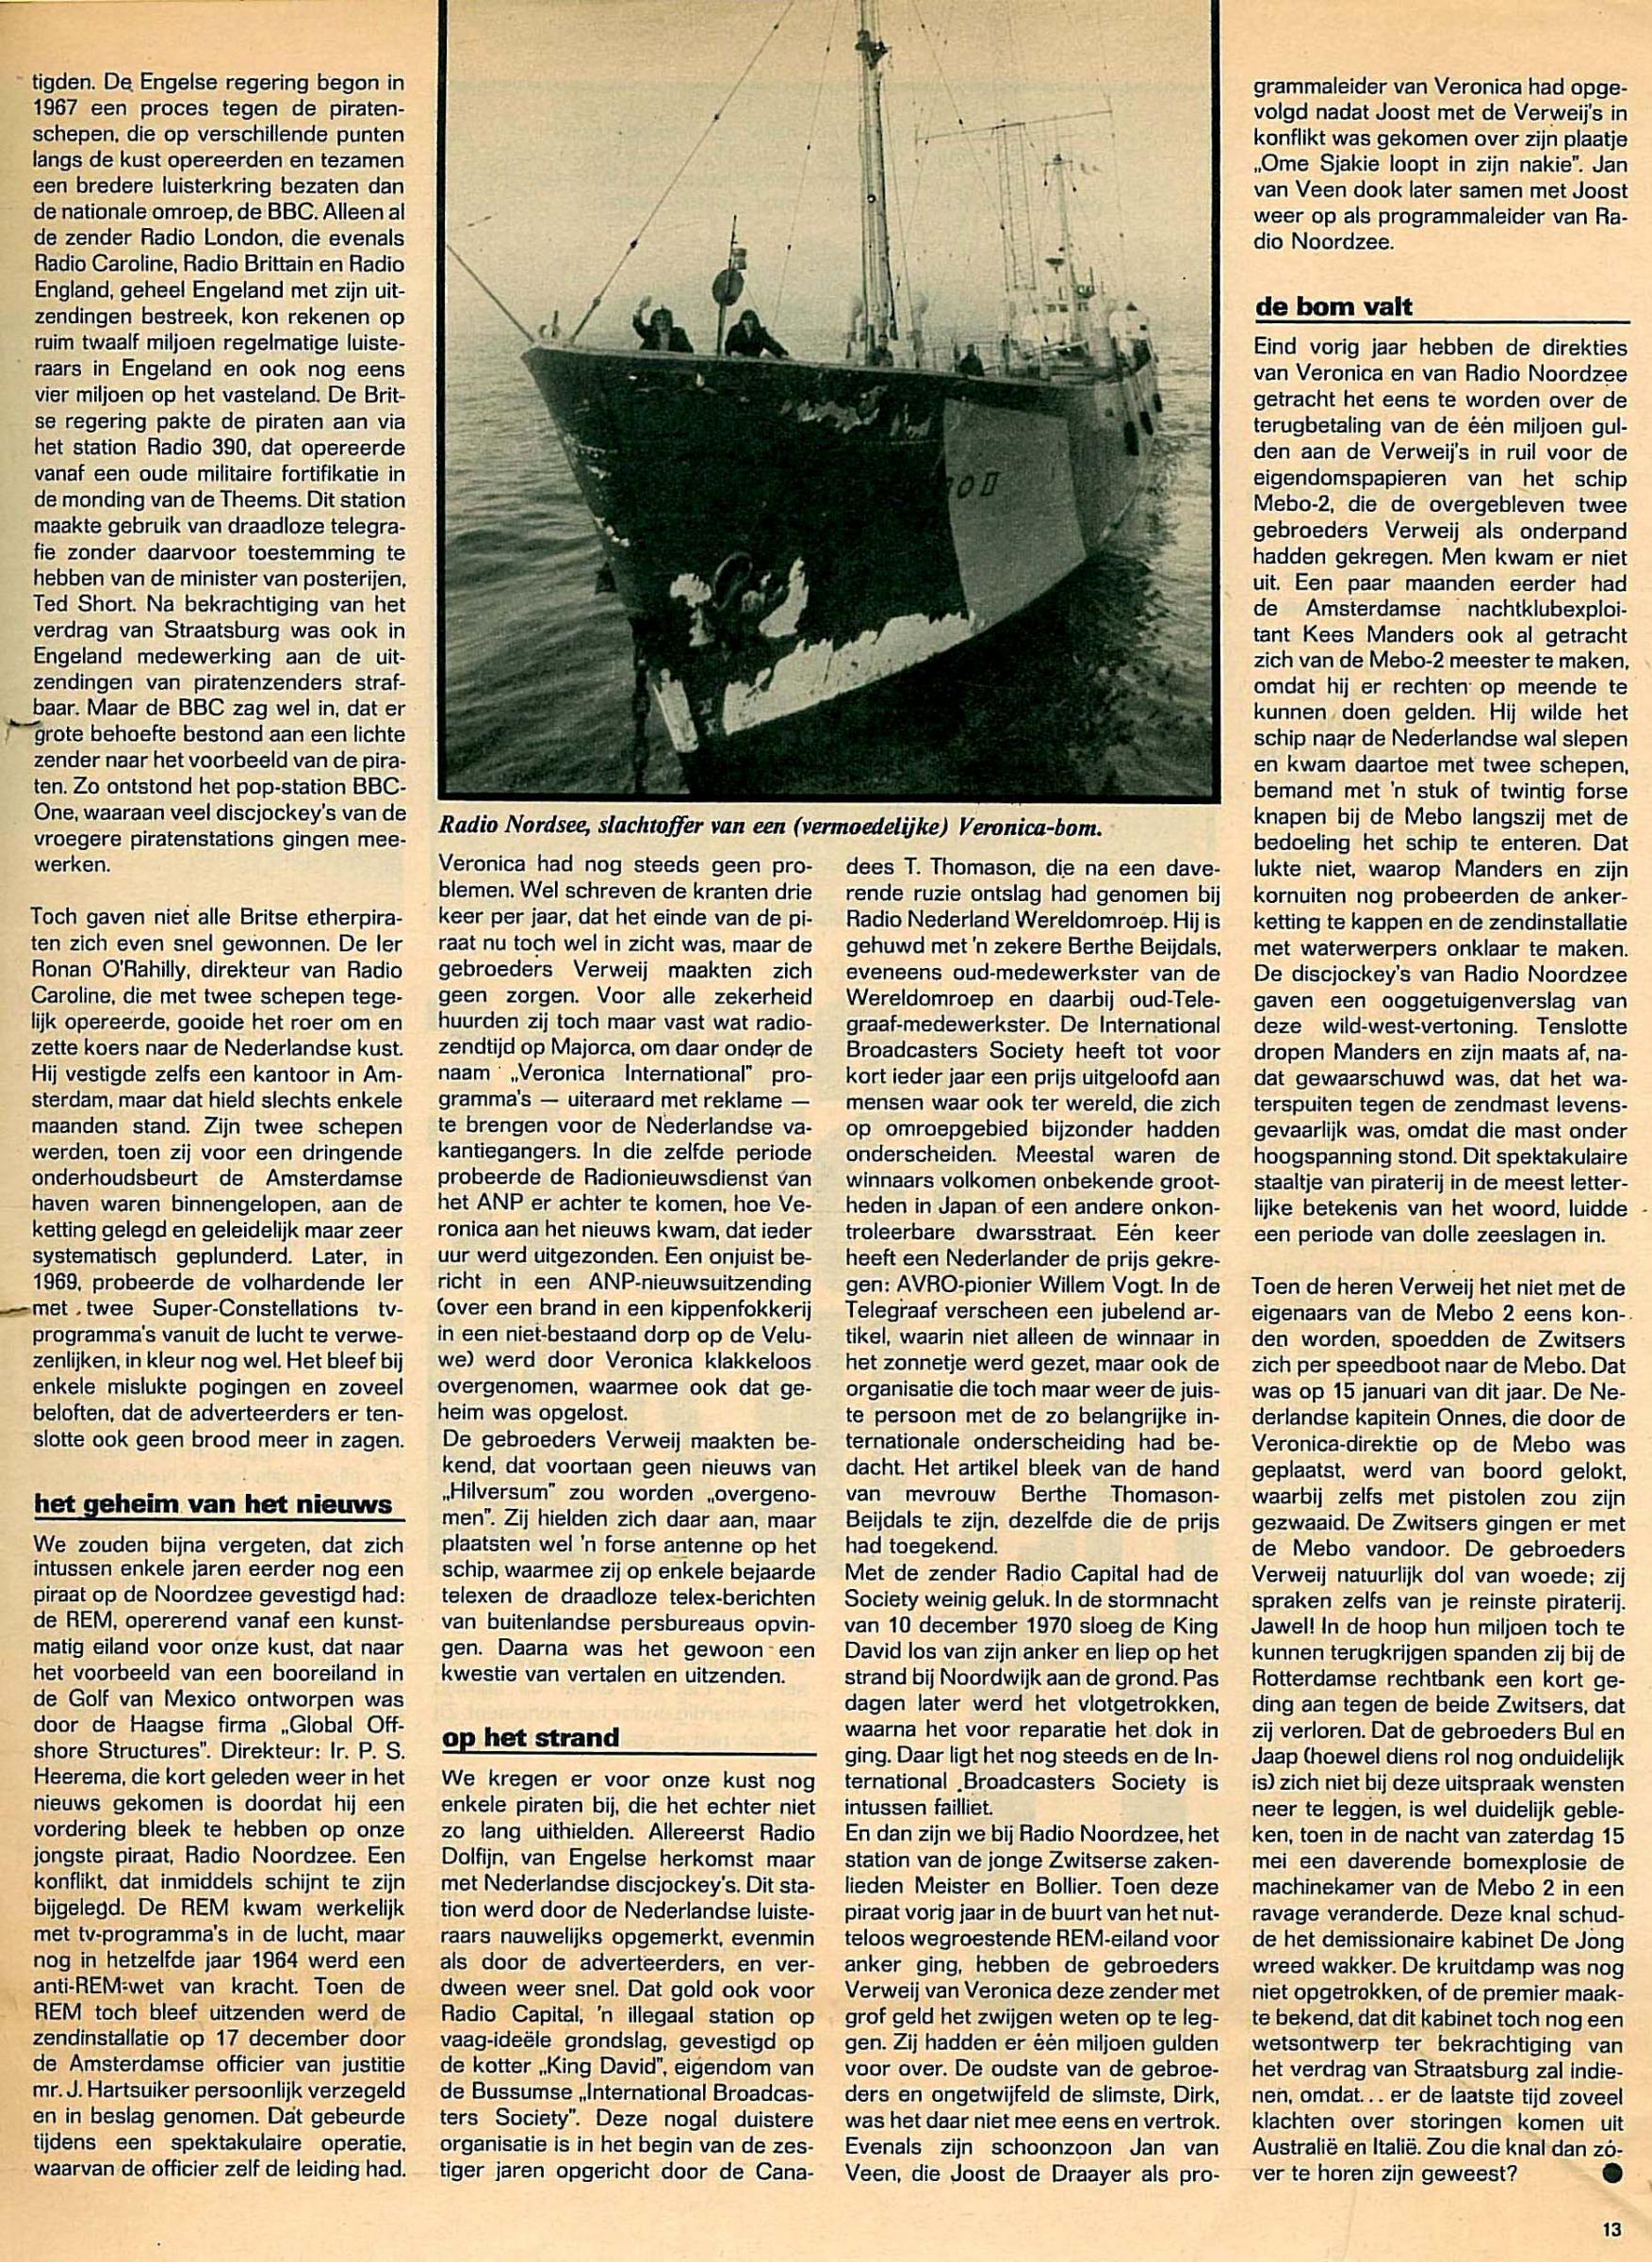 19710626 evt_Studio_Dag piraten Ver_RNI_Cap_Car04.jpg